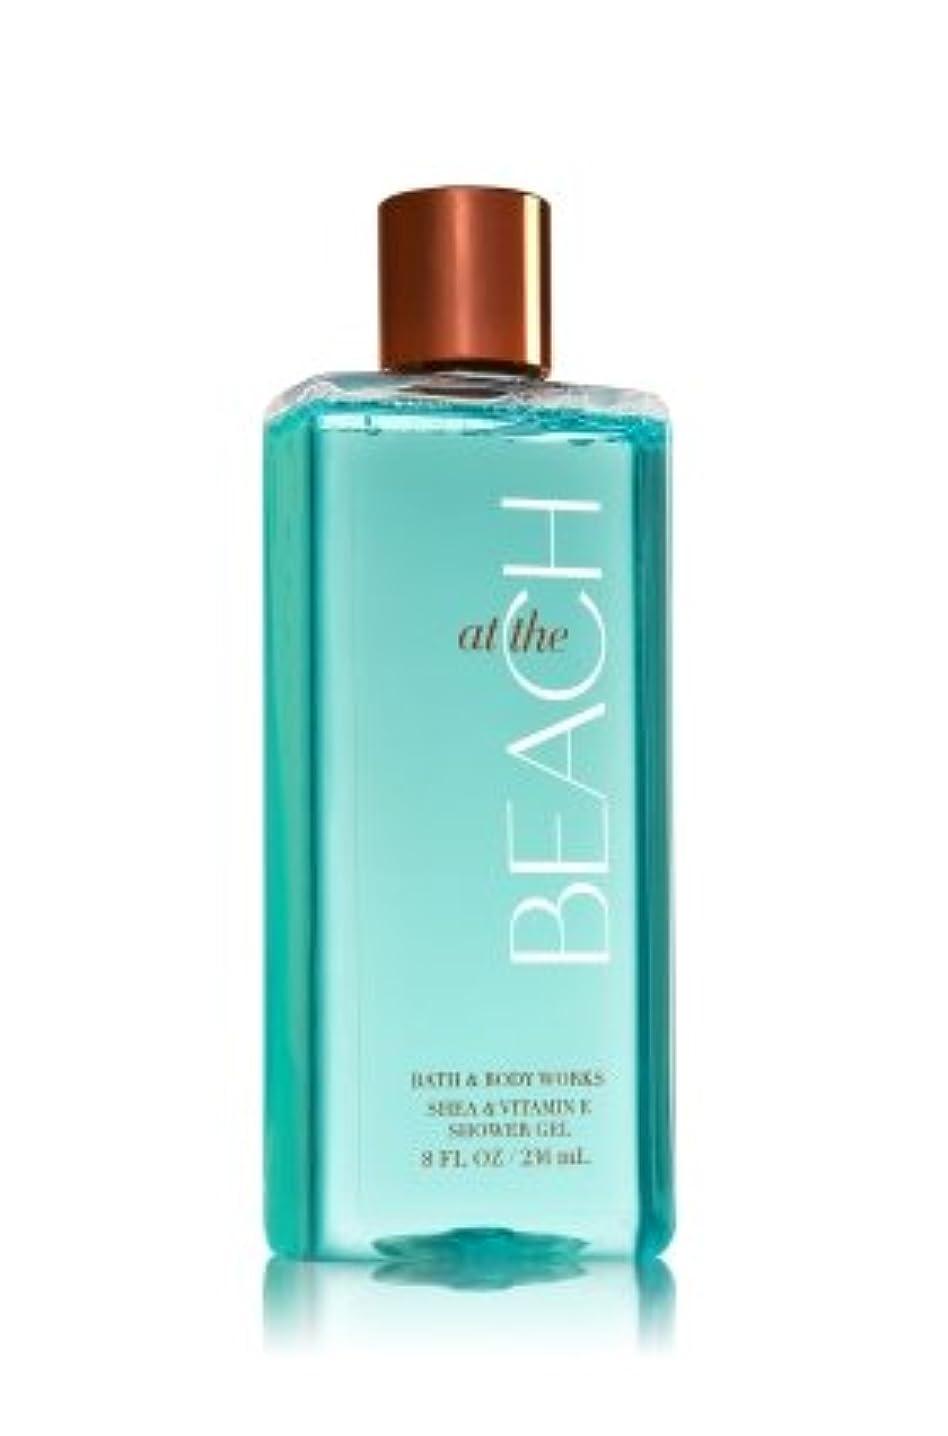 【Bath&Body Works/バス&ボディワークス】 シャワージェル アットザビーチ Shower Gel At The Beach 8 fl oz / 236 mL [並行輸入品]